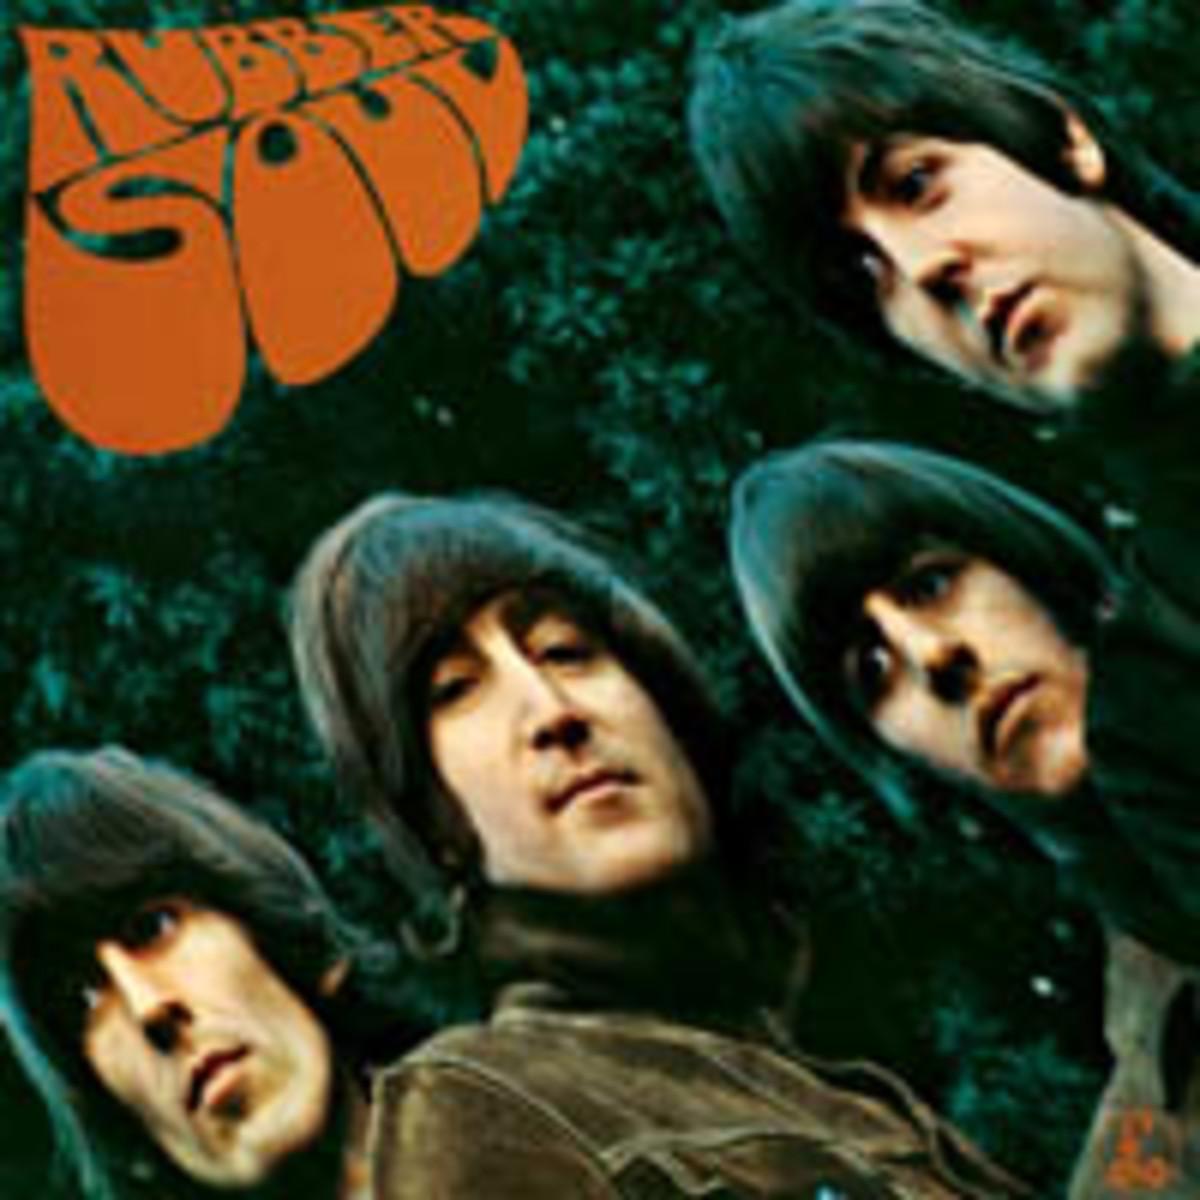 Beatles_RubberSoul